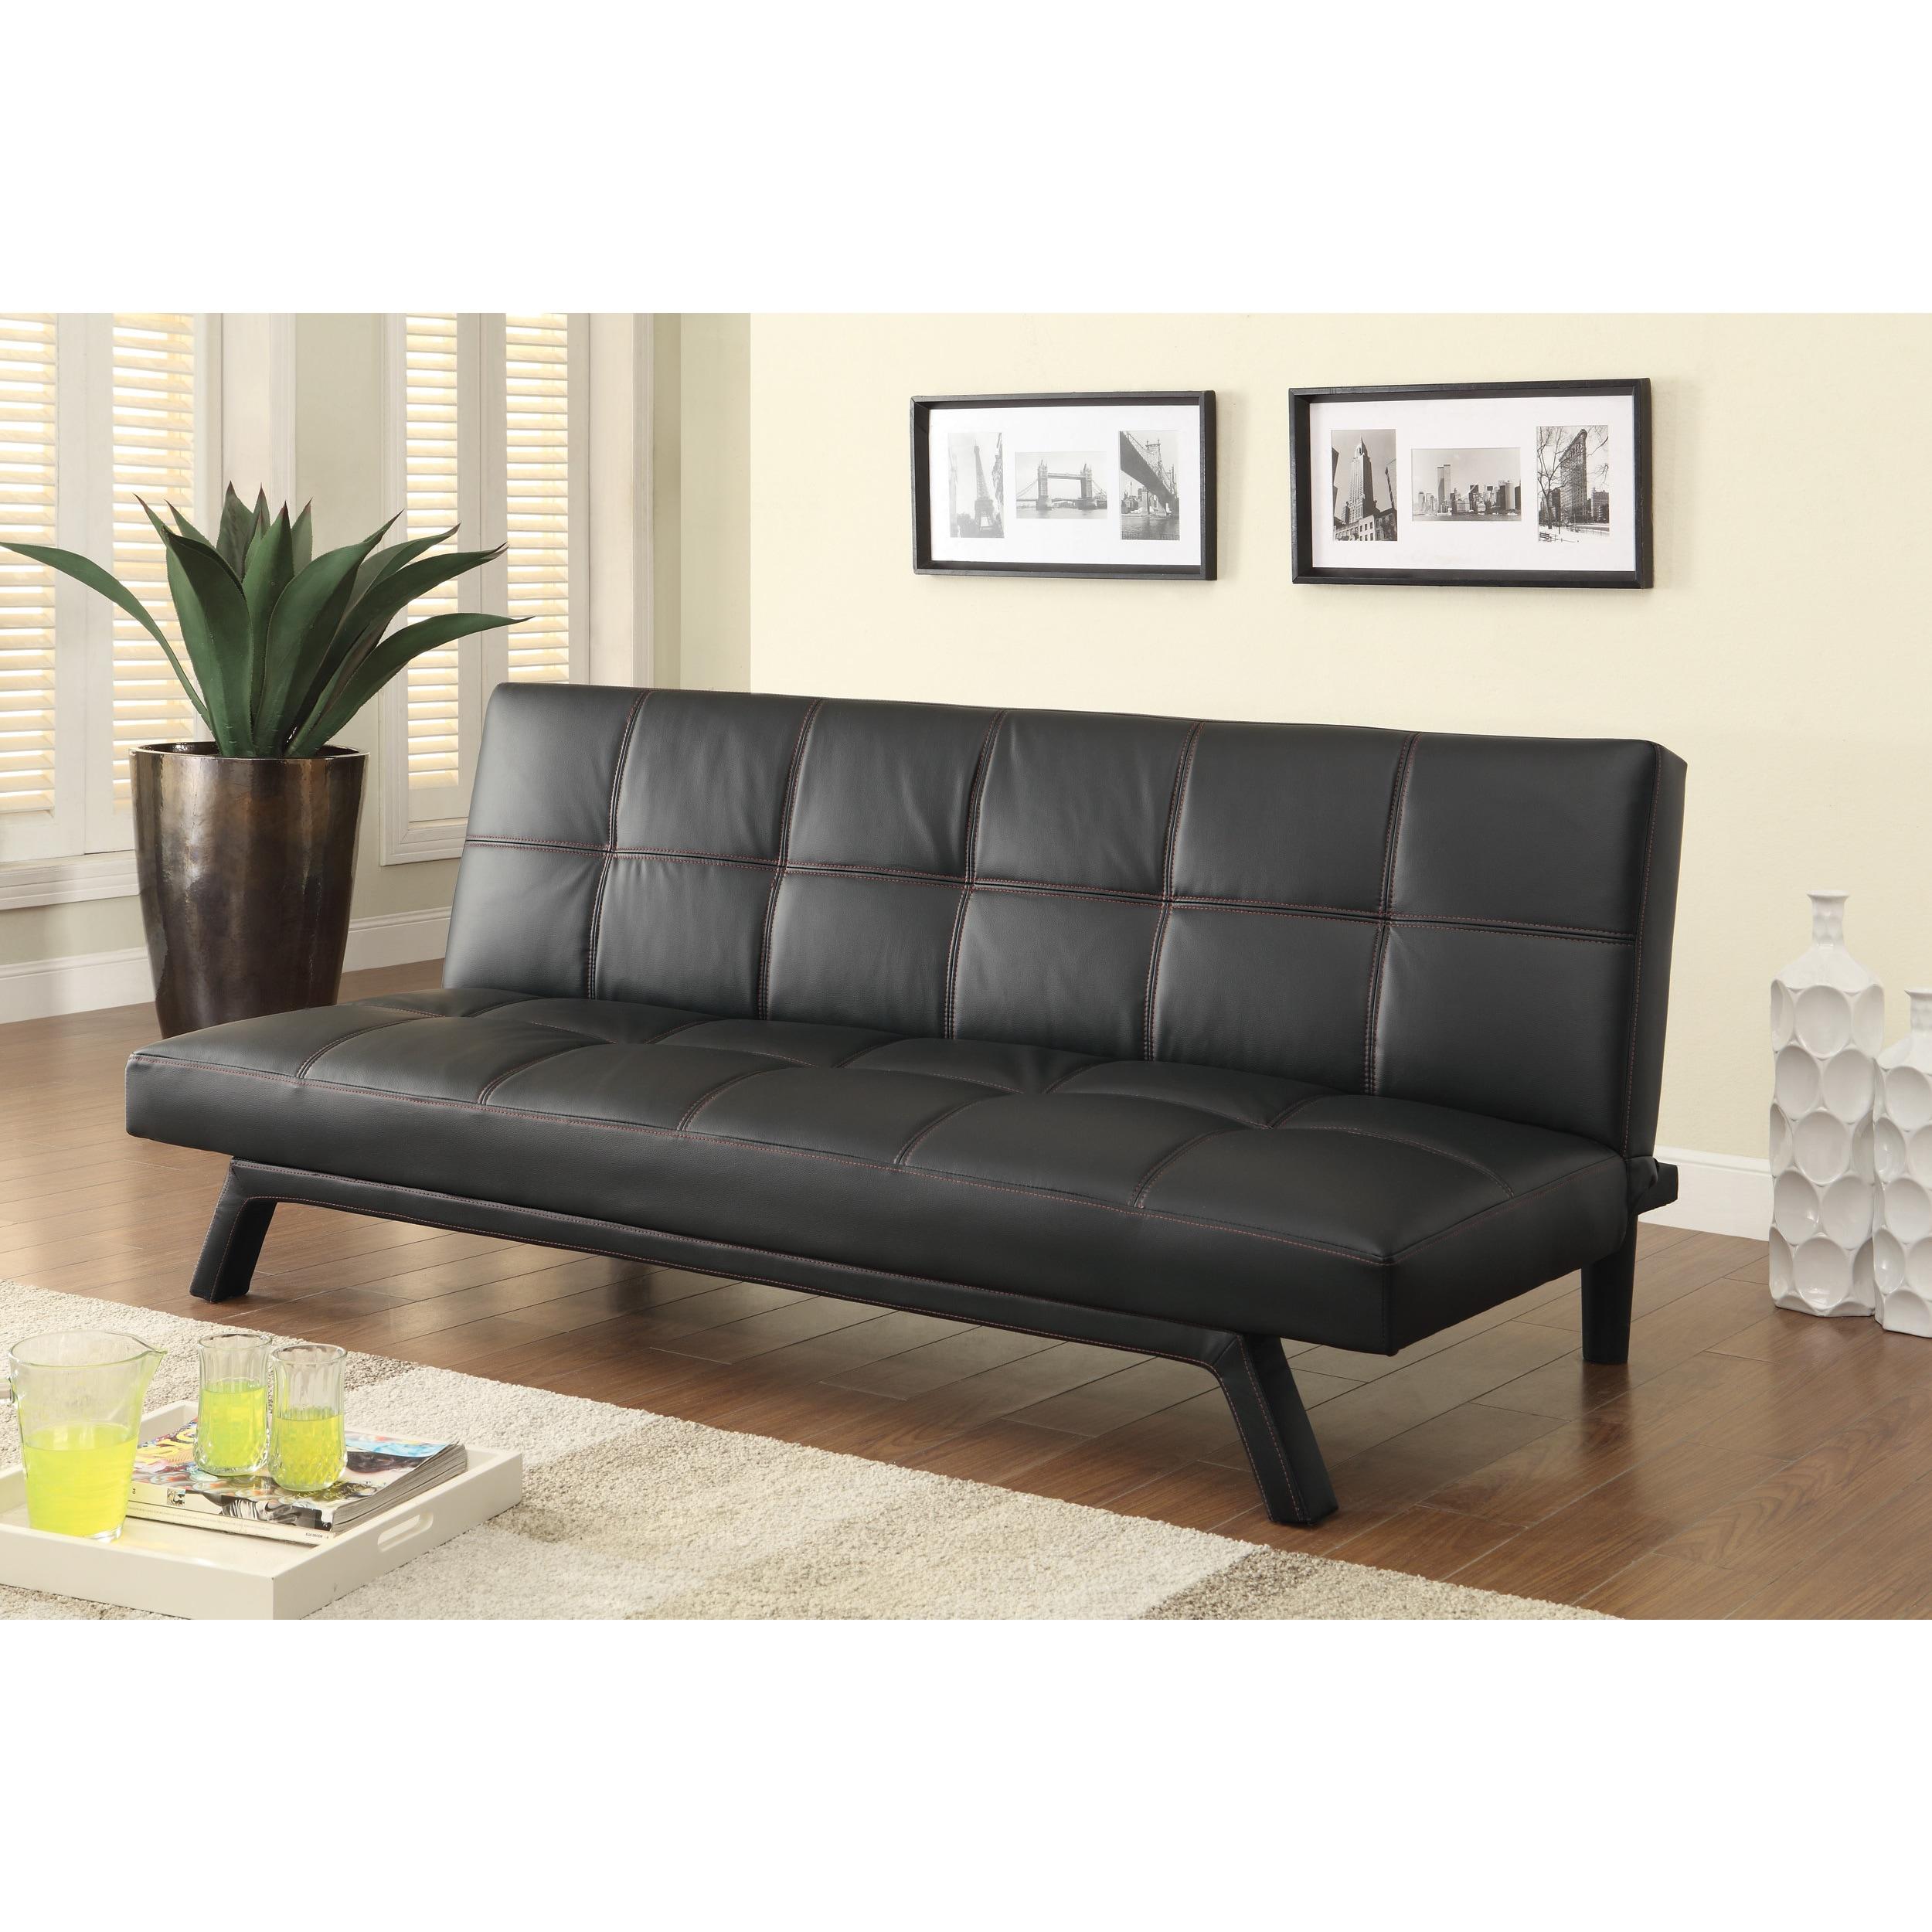 Leatherette Sofa Bed 71 50 X